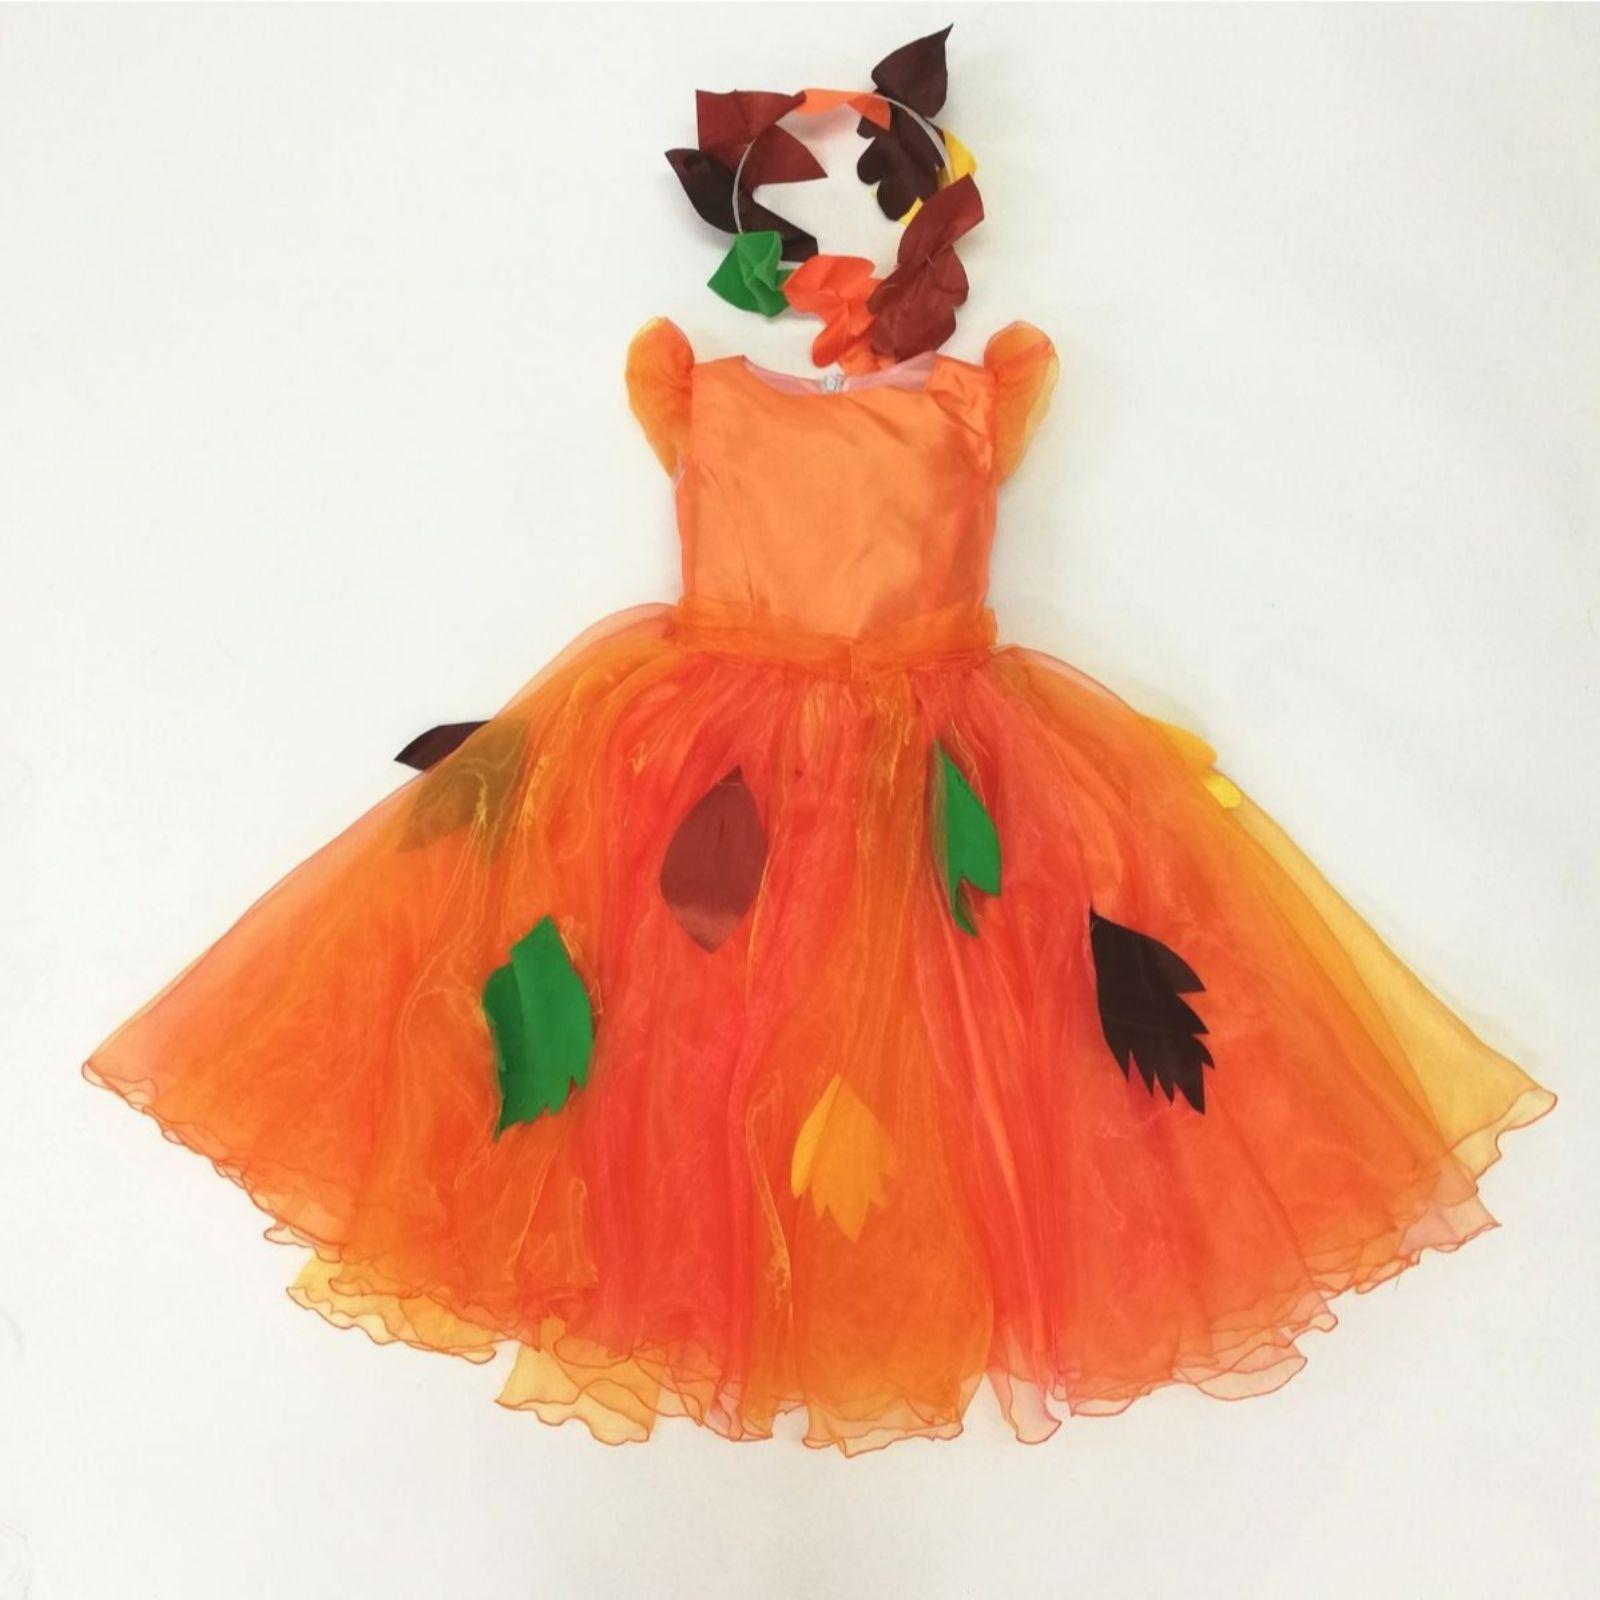 Rochița Zâna Toamnă portocaliu